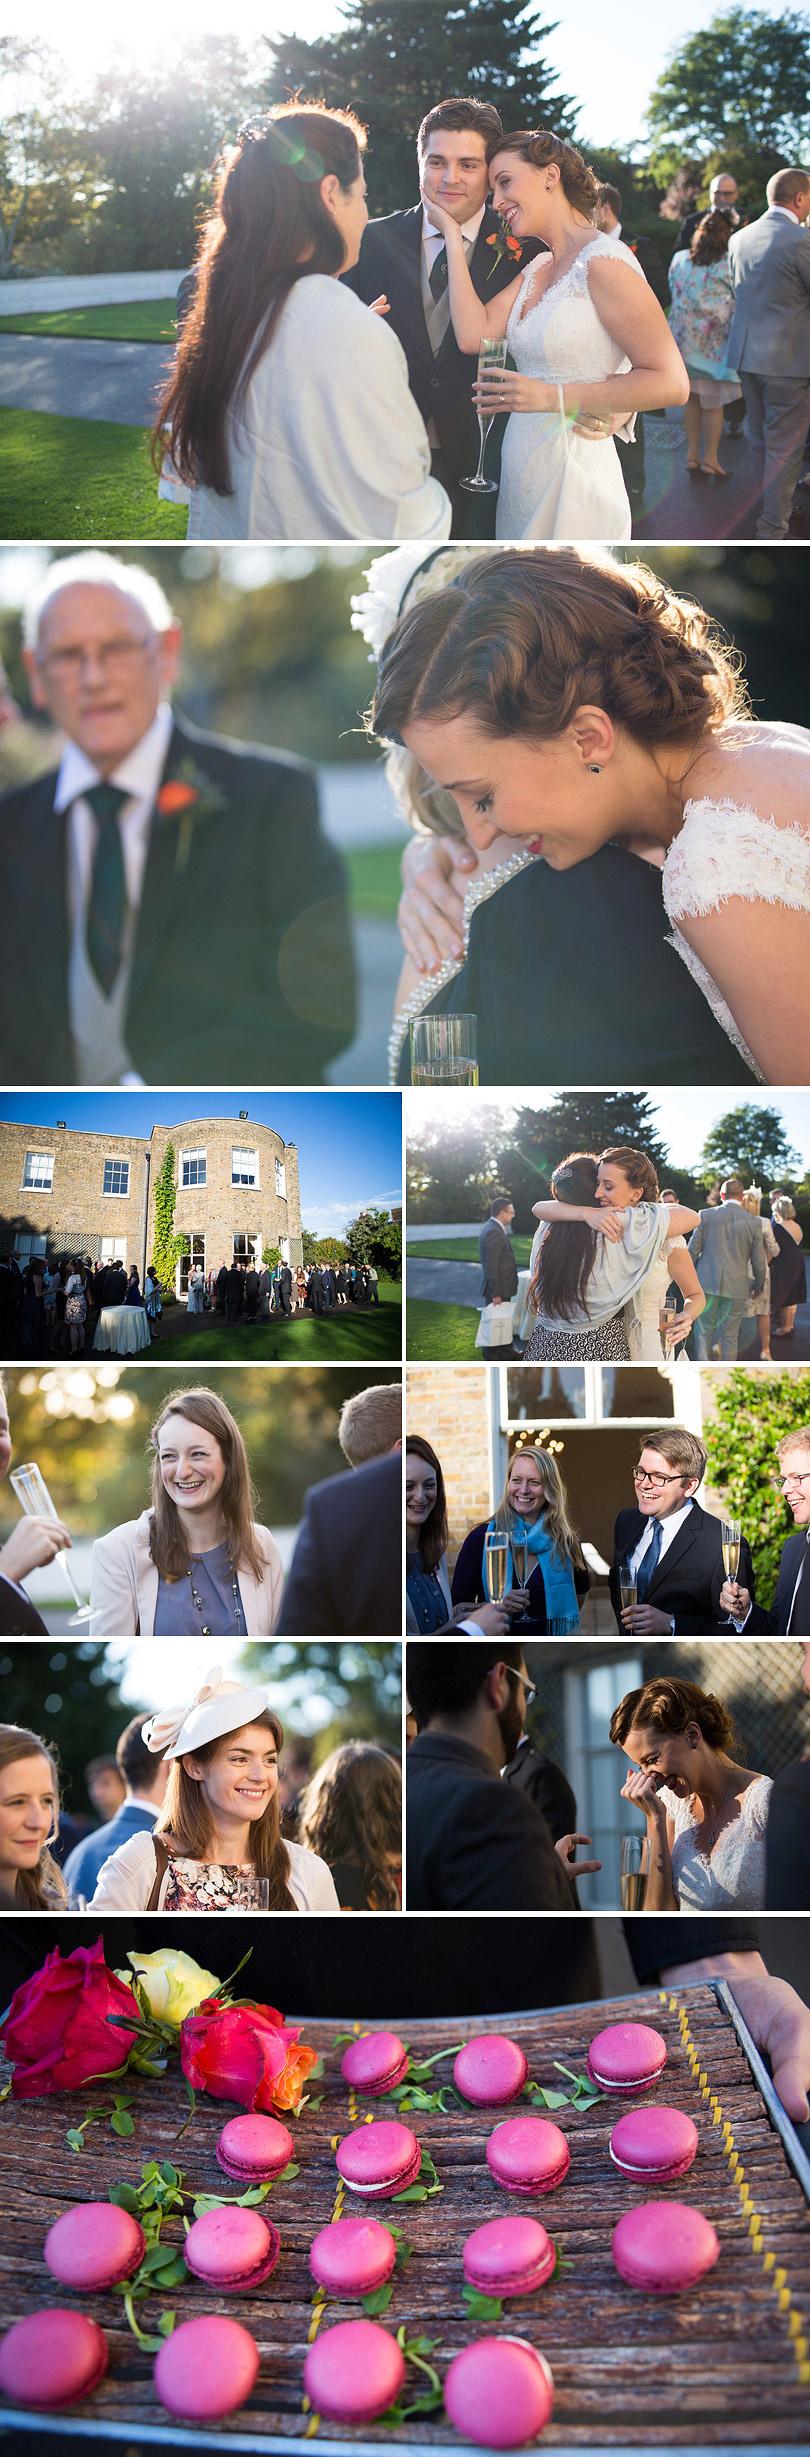 L&I_Cambridge-Cottage-Kew-Gardens-Wedding_14.jpg